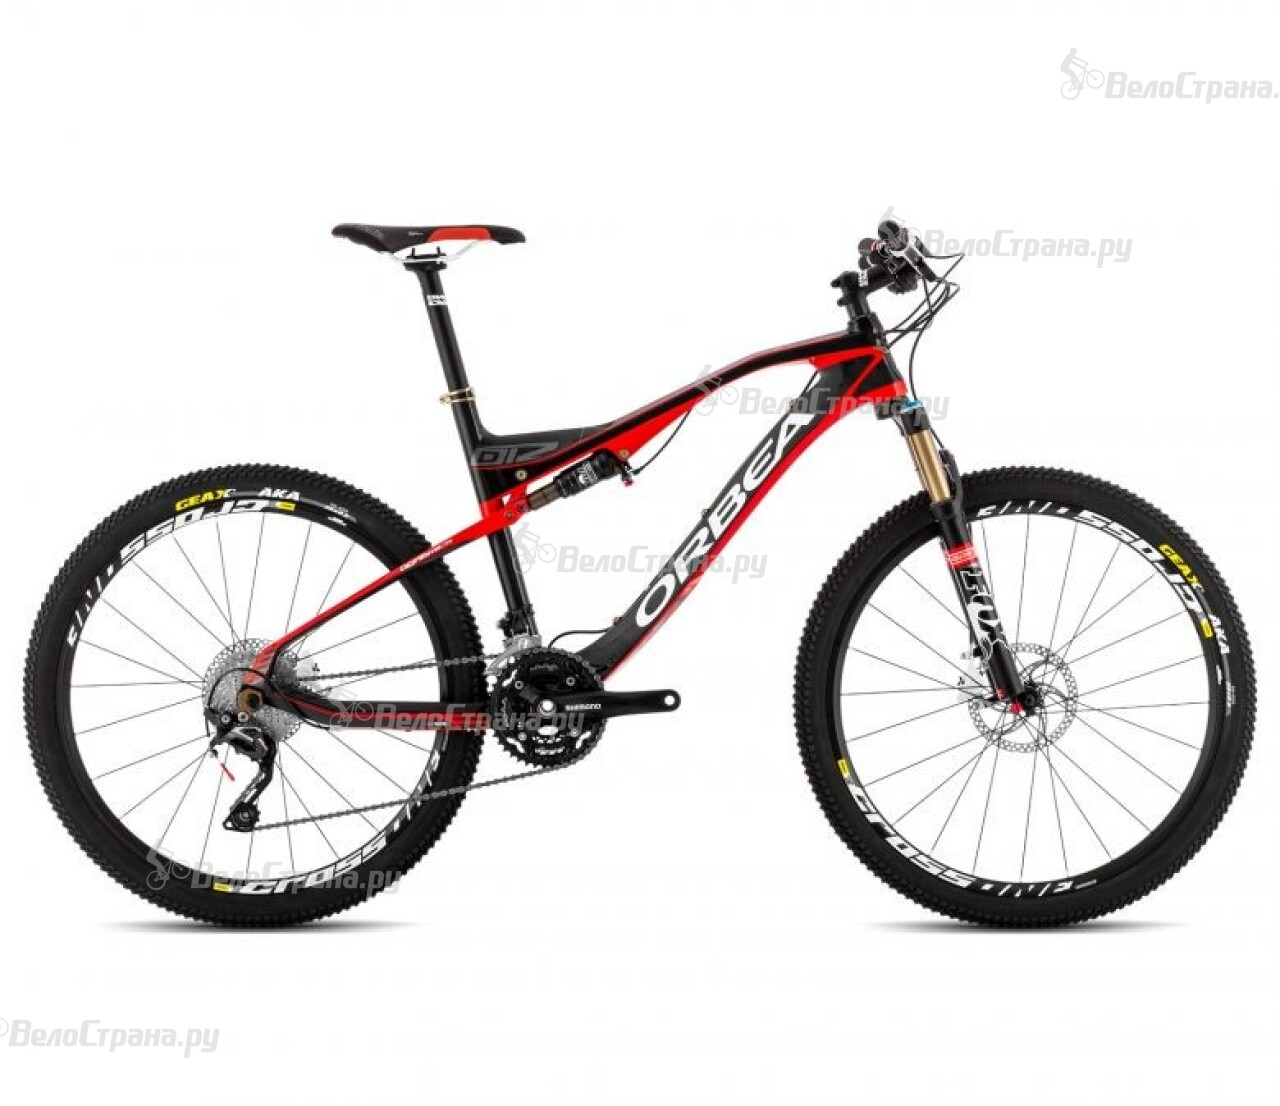 Велосипед Orbea Oiz M50 (2014) аккумулятор для ноутбука oem 5200mah asus n61 n61j n61d n61v n61vg n61ja n61jv n53 a32 m50 m50s n53s n53sv a32 m50 a32 n61 a32 x 64 33 m50 n53s n53 a32 m50 m50s n53s n53sv a32 m50